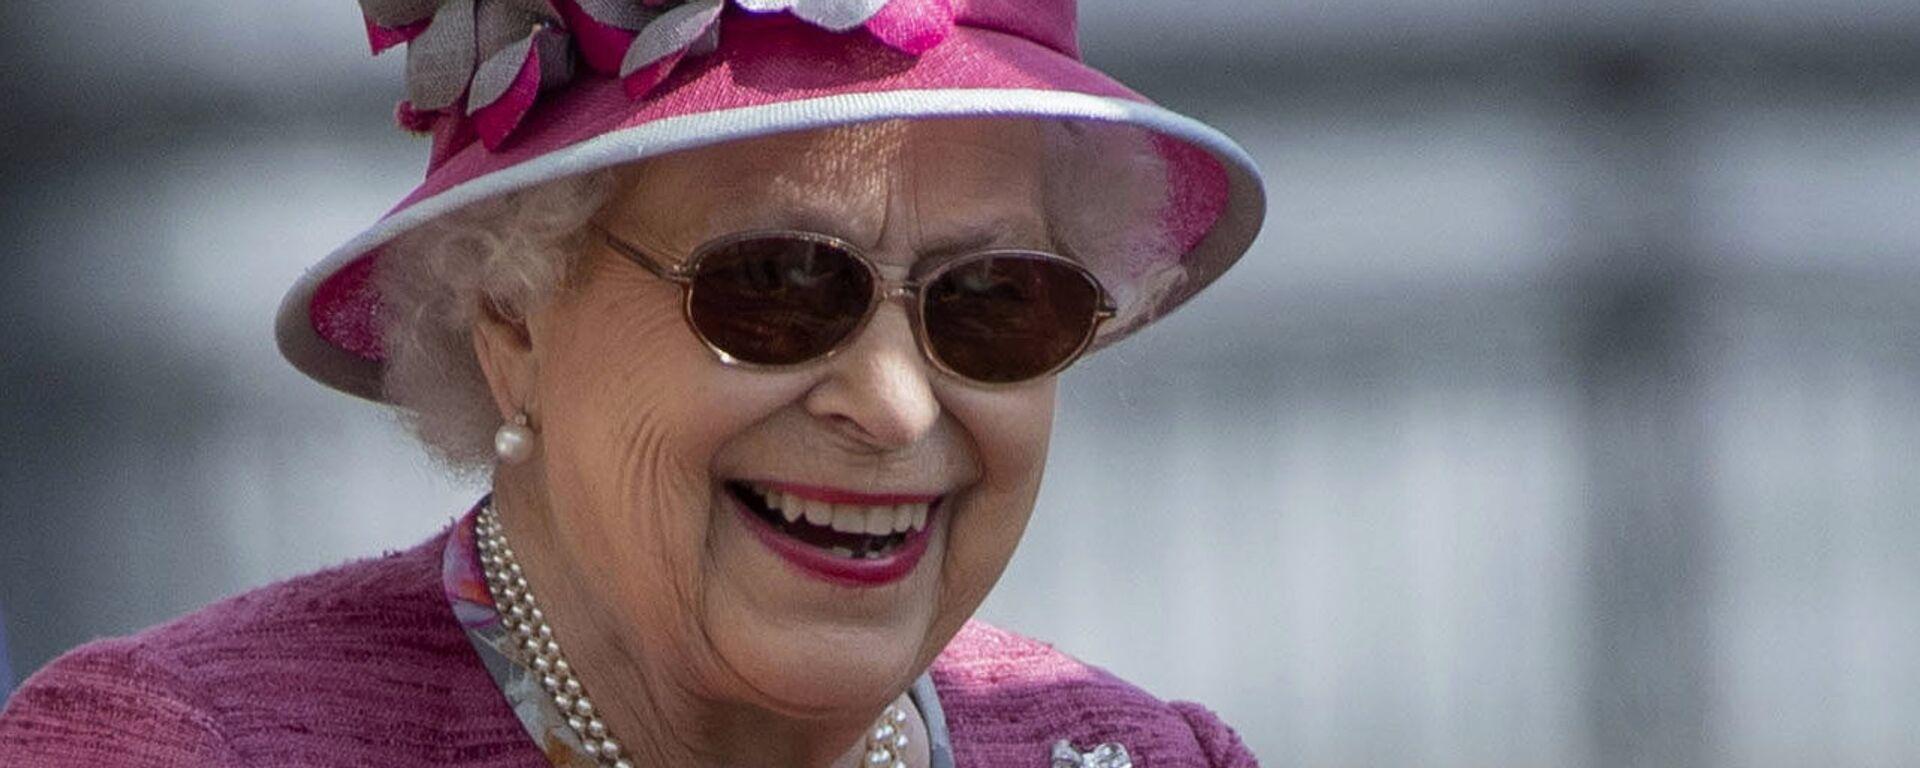 La reina Isabel II del Reino Unido - Sputnik Mundo, 1920, 02.09.2019